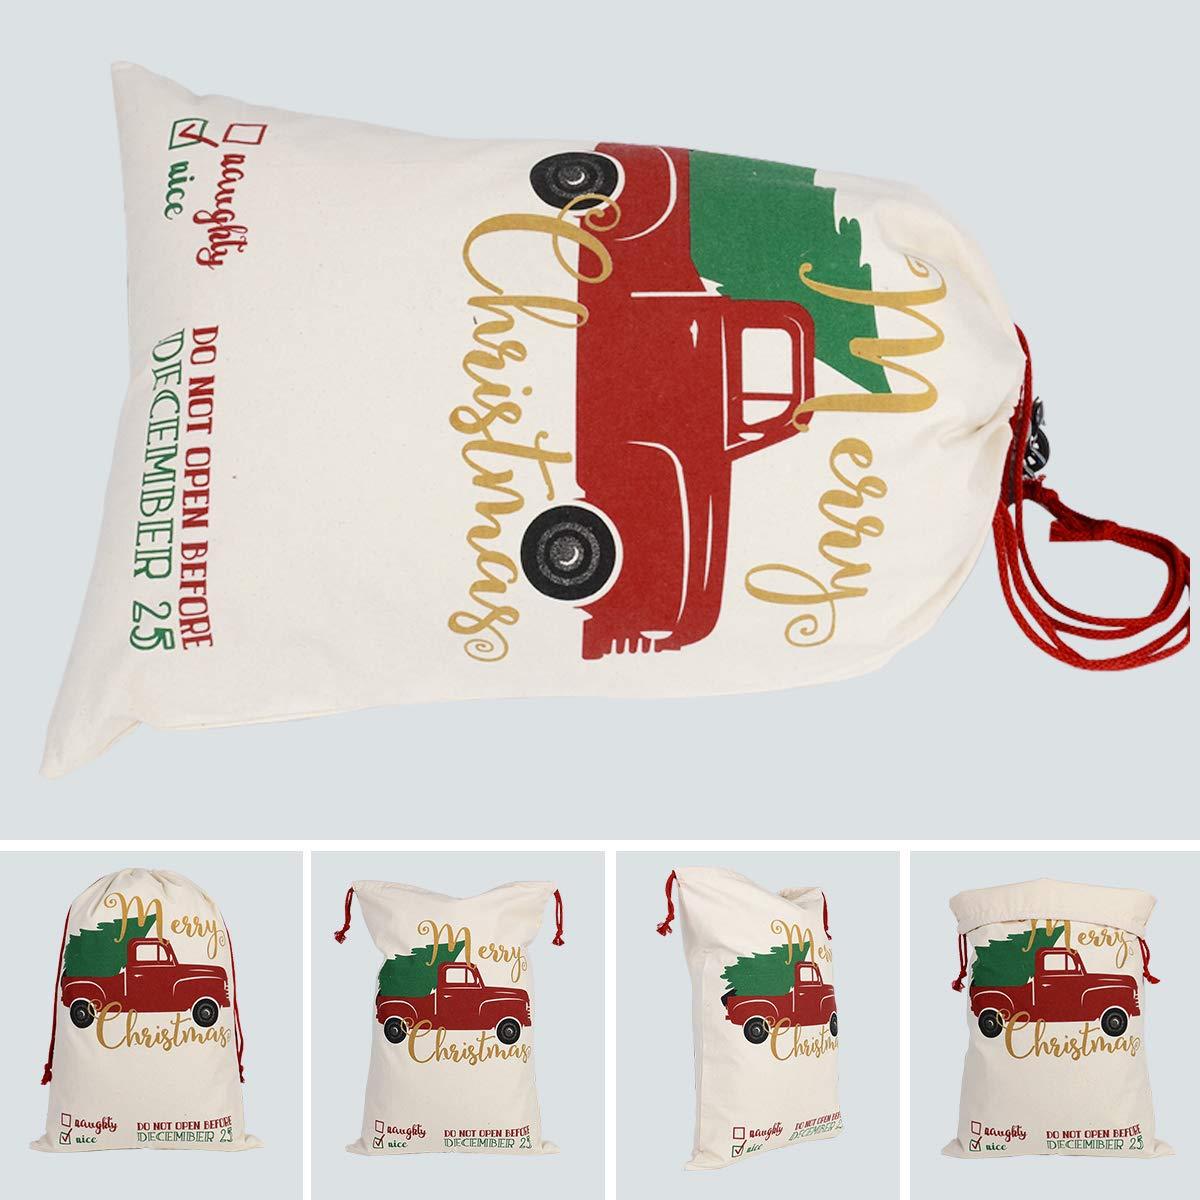 Xunlong Santa Sack Christmas Bag Large Cotton Santa Bag with Drawstrings 27.5x19.5 3 Pack Pattern 1